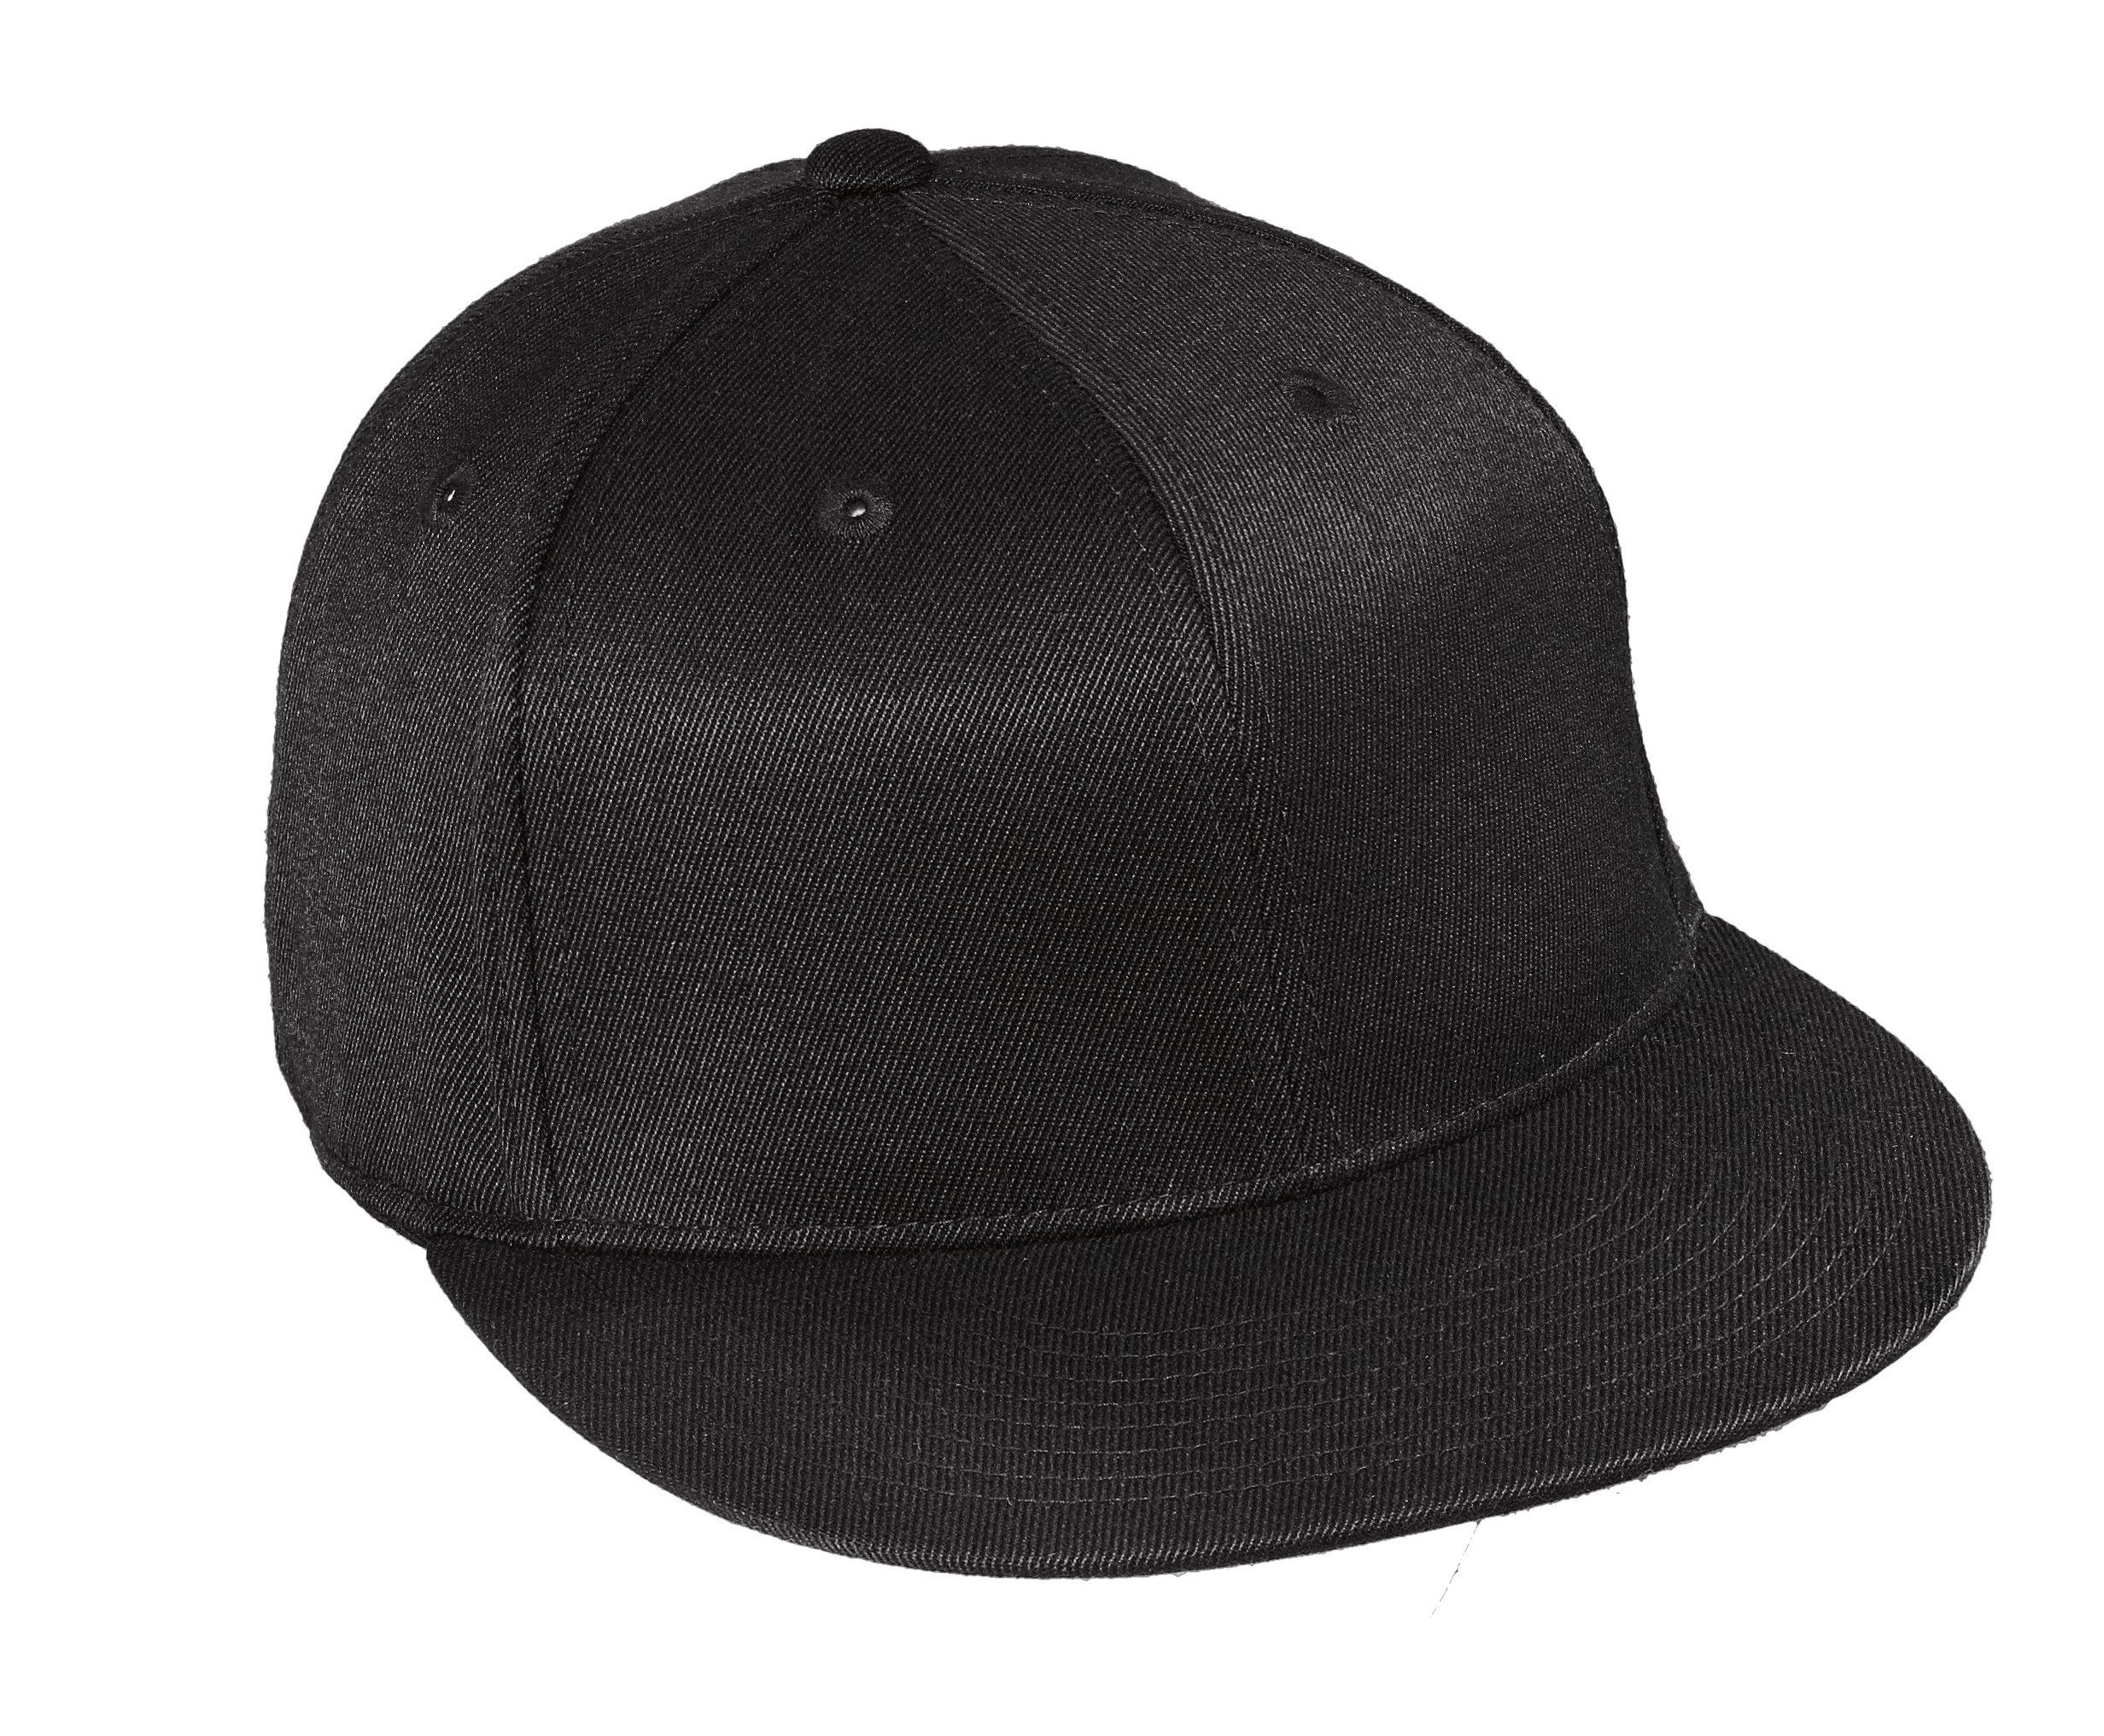 Stretch Fit Flat Bill Caps Wholesale Cap Wholesale Hats Custom Hats